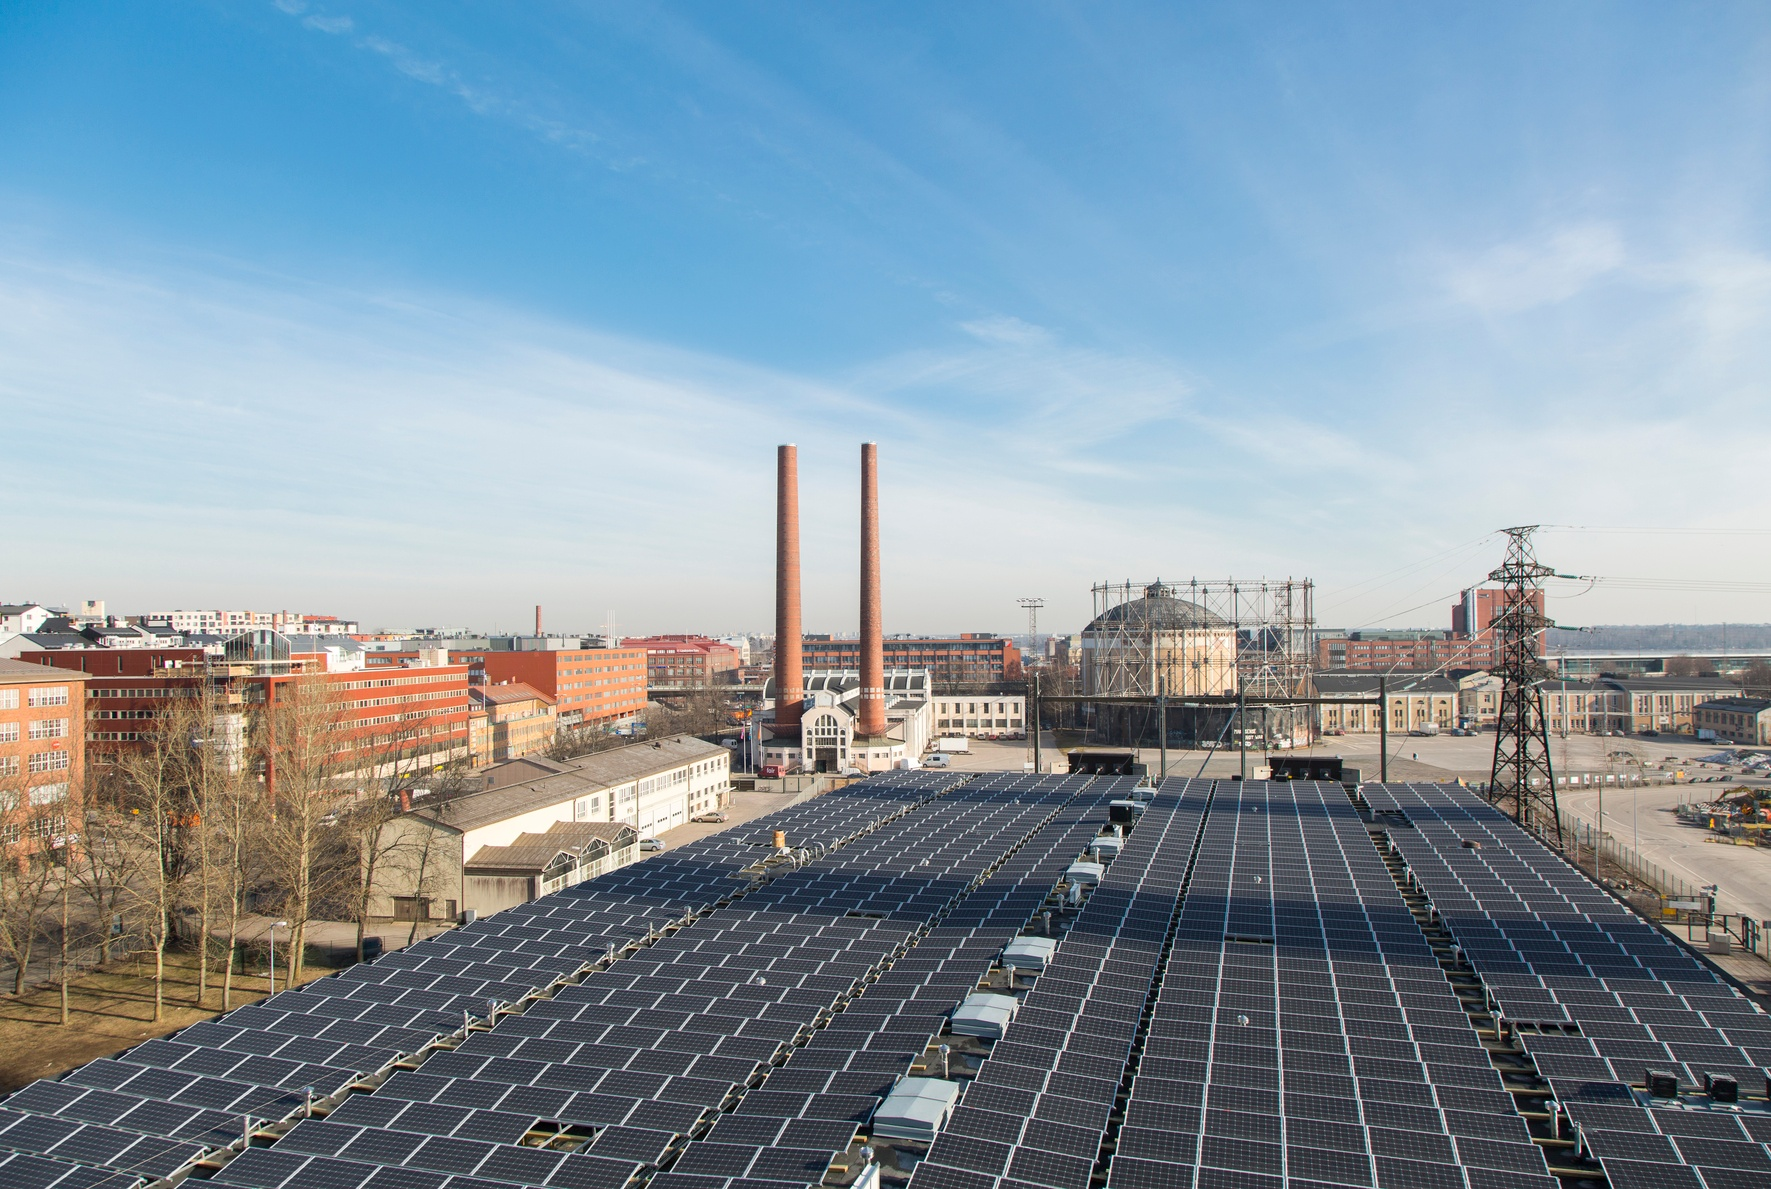 Helen, Toshiba, Landis+Gyr: The biggest battery energy storage installation in the Nordics